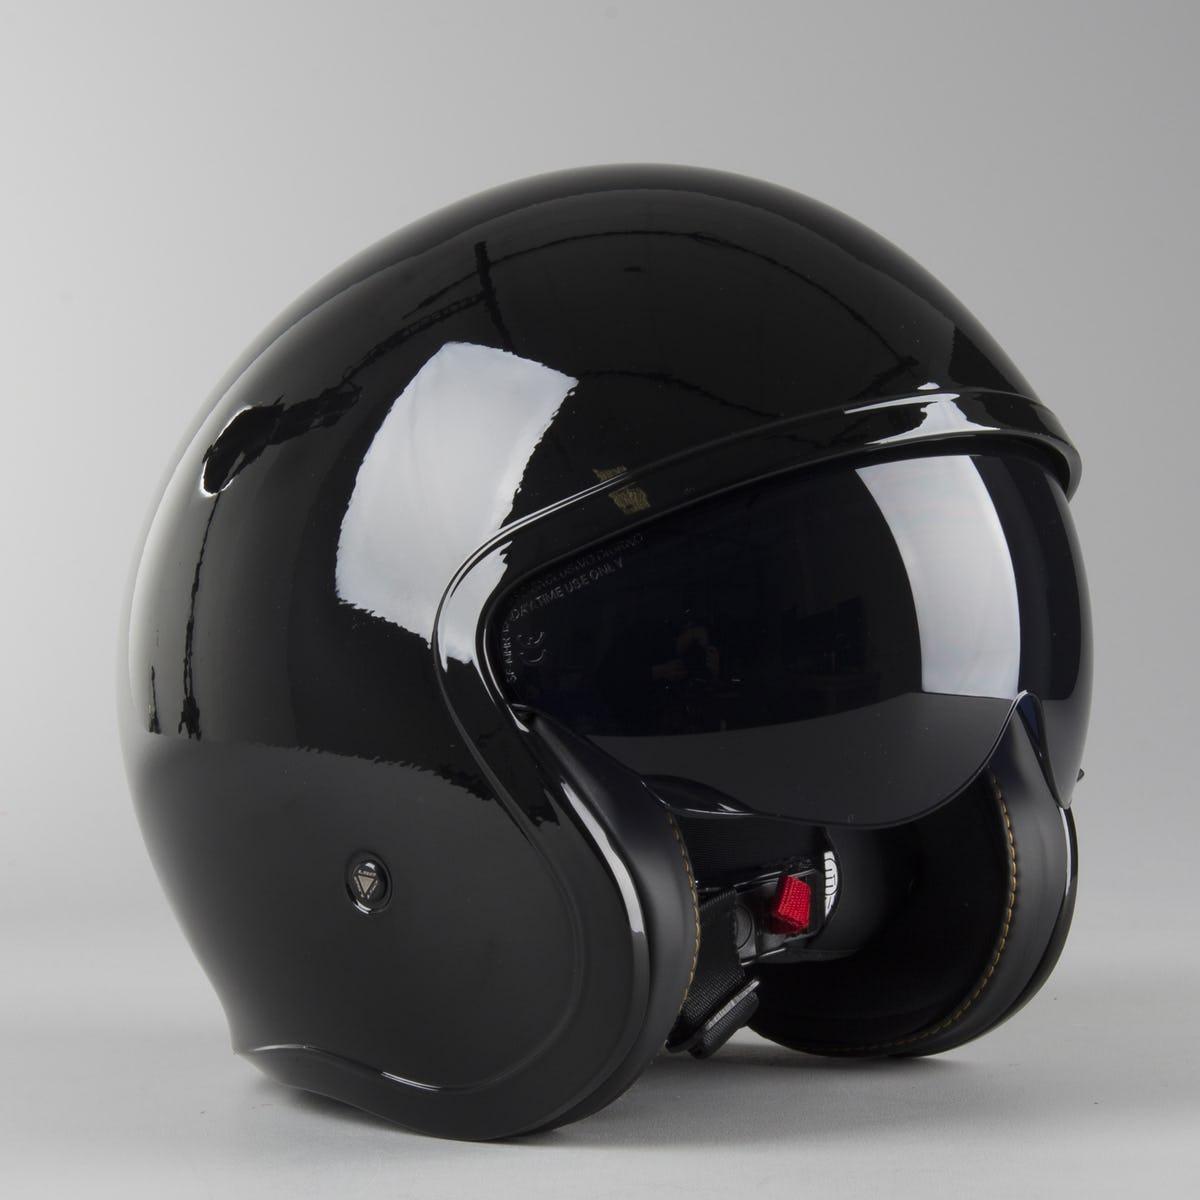 Мотошолом LS2 OF599 Gloss black Чорний глянсовий полулецевик з окулярами